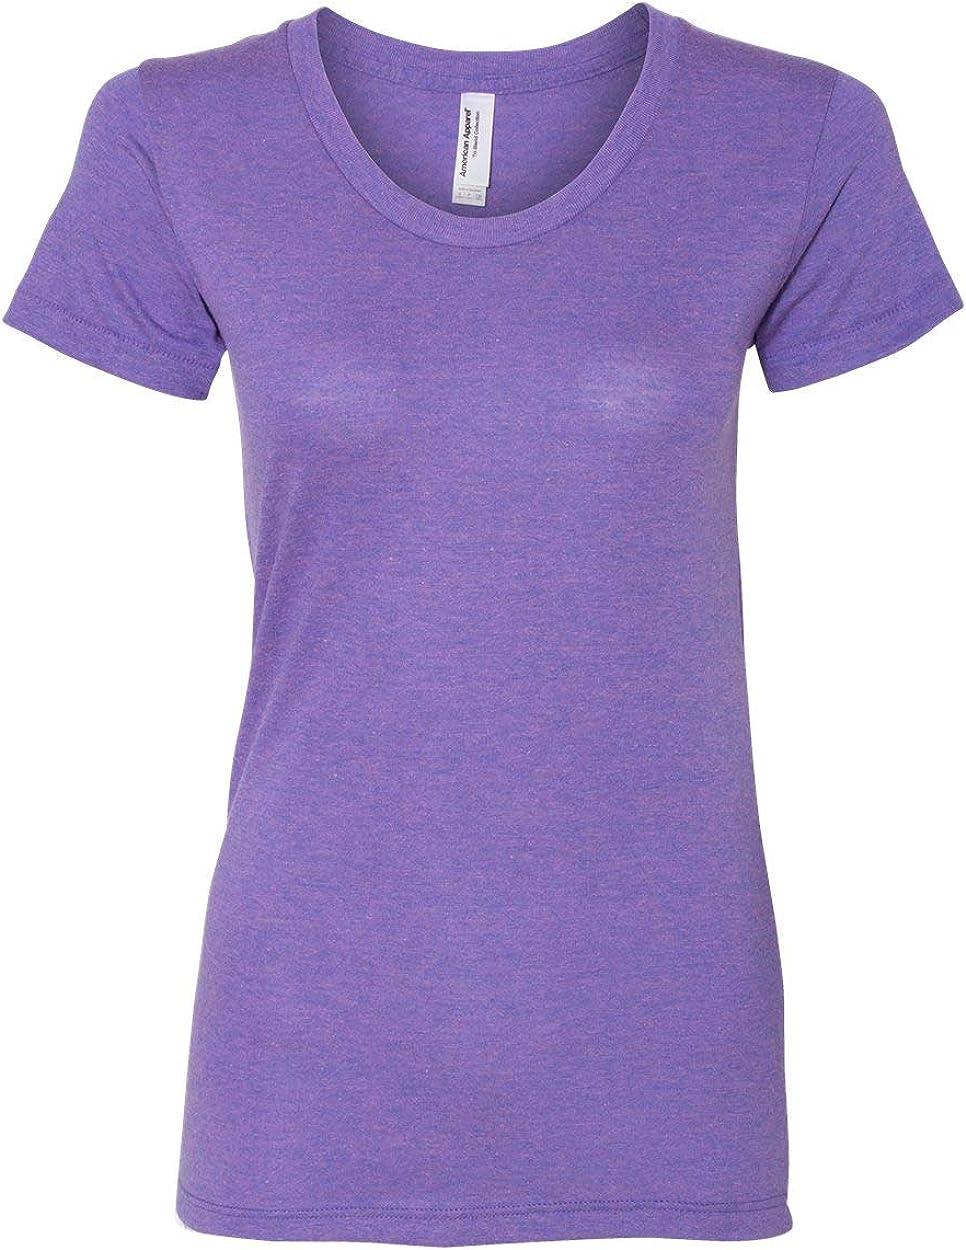 American Apparel TR301W Ladies Triblend Short-Sleeve Track T-Shirt